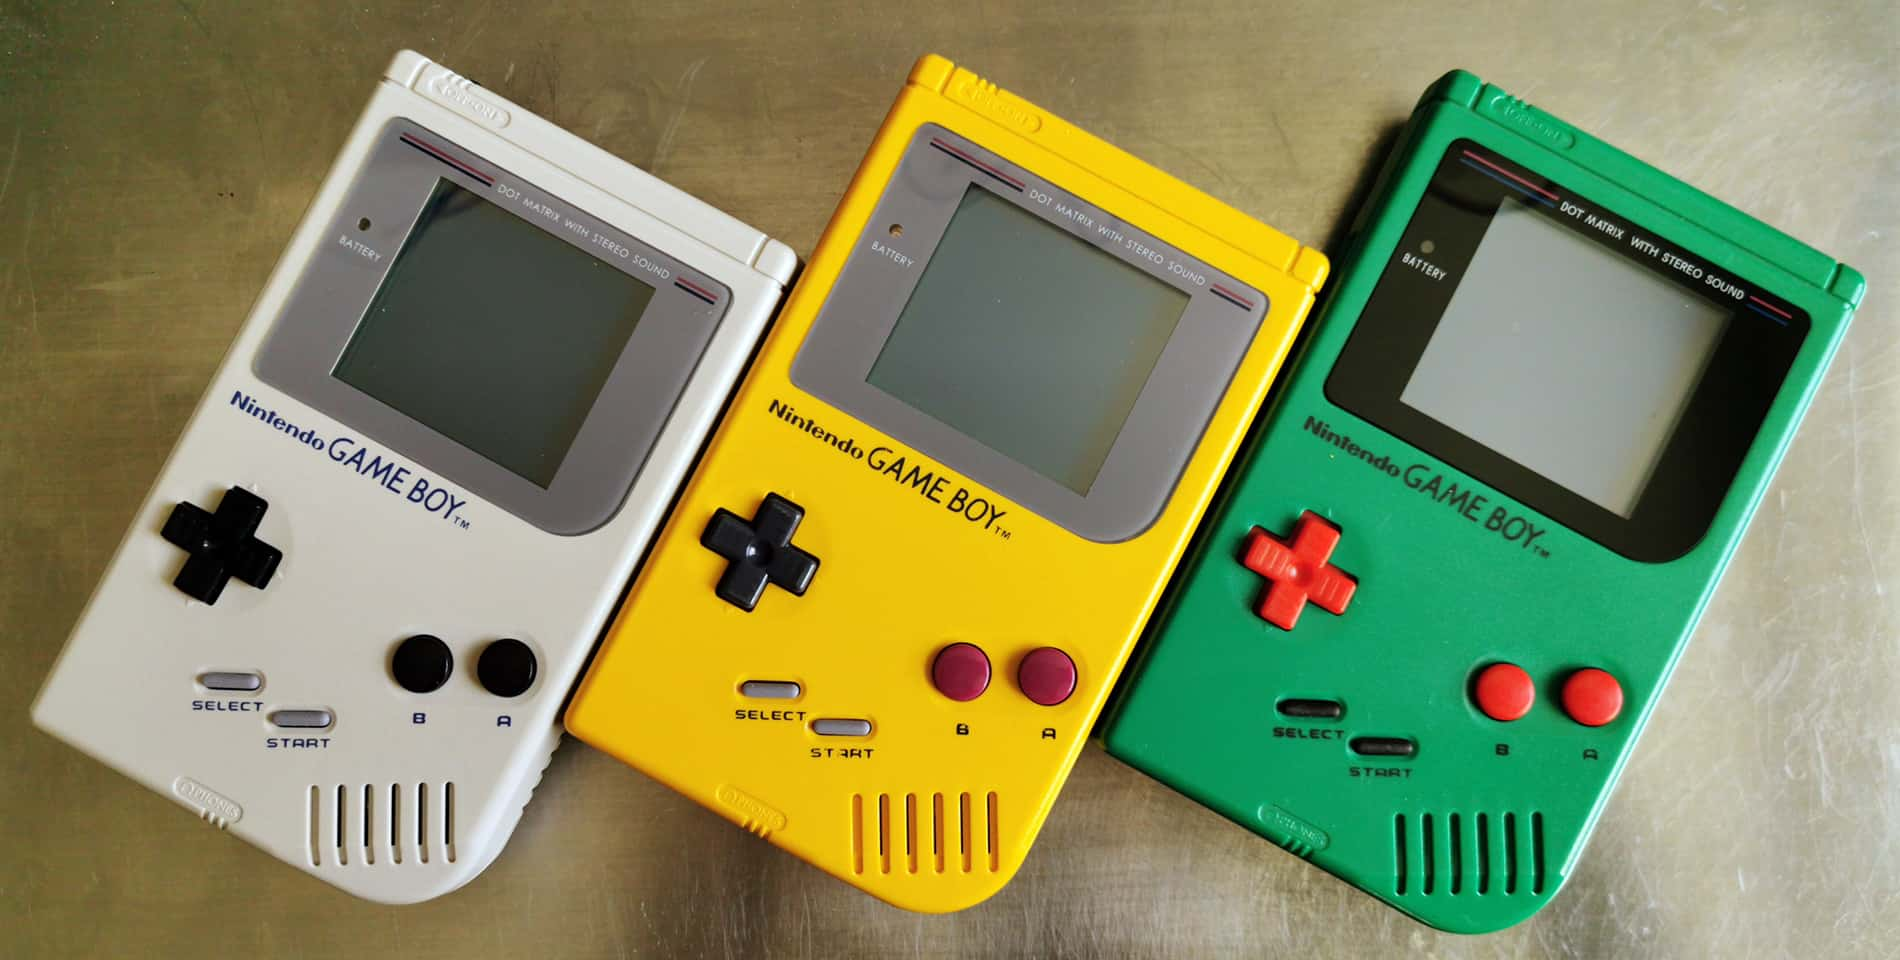 Gameboy Gray, Yellow, Green